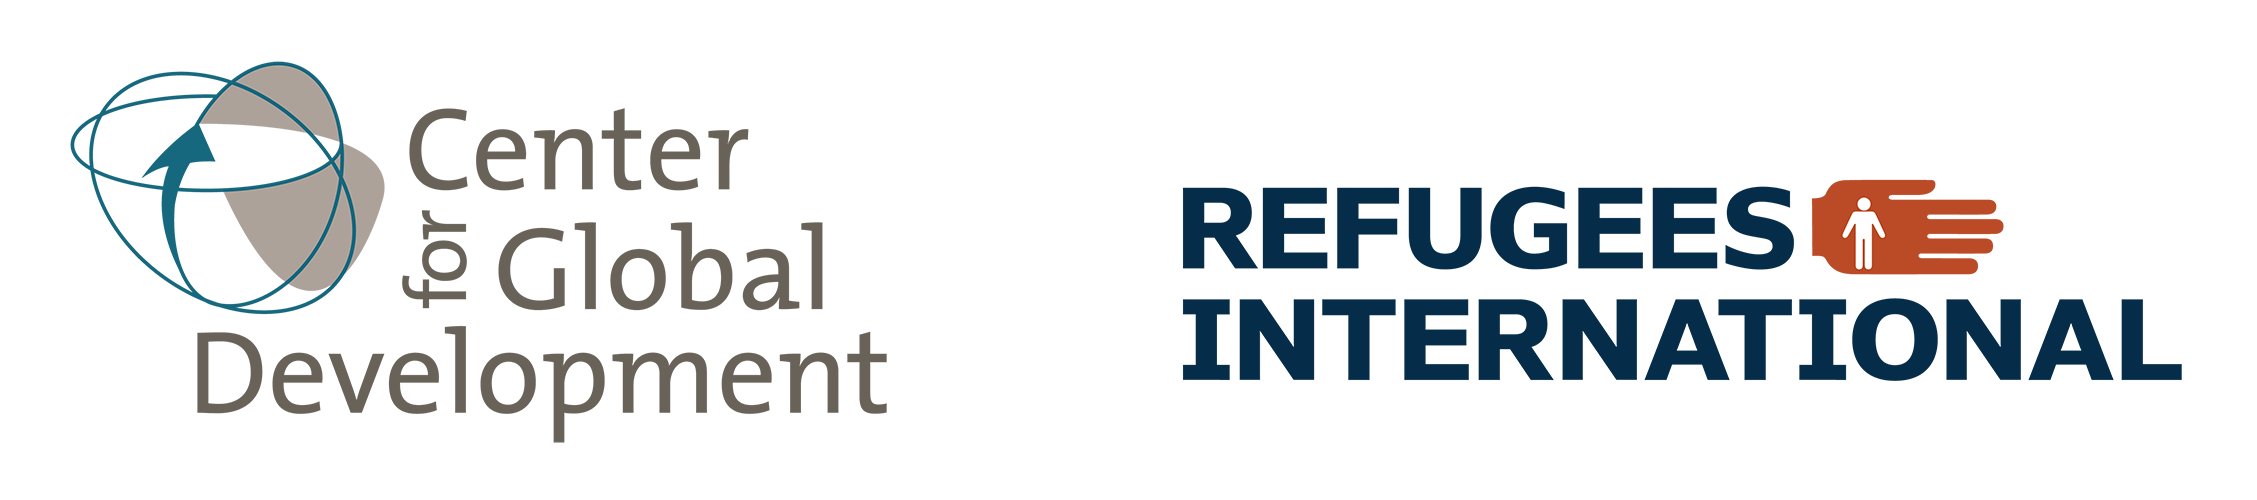 CGD and RI logos